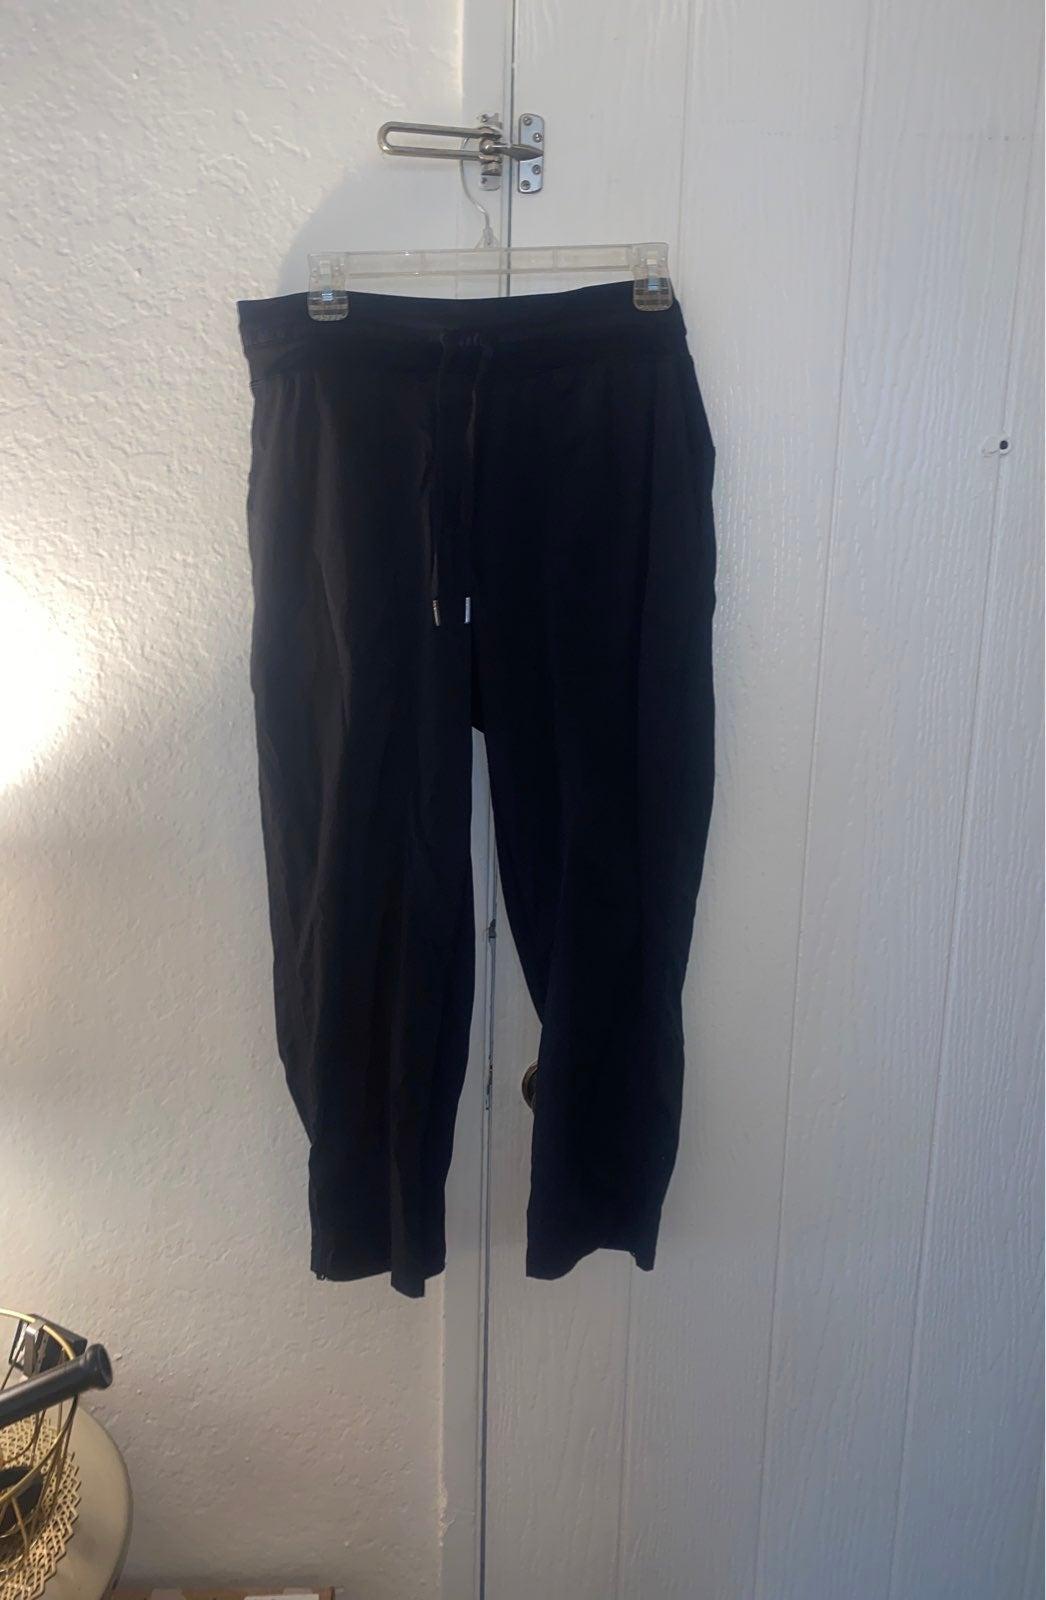 Lululemon Black Jogger Pants Size 12